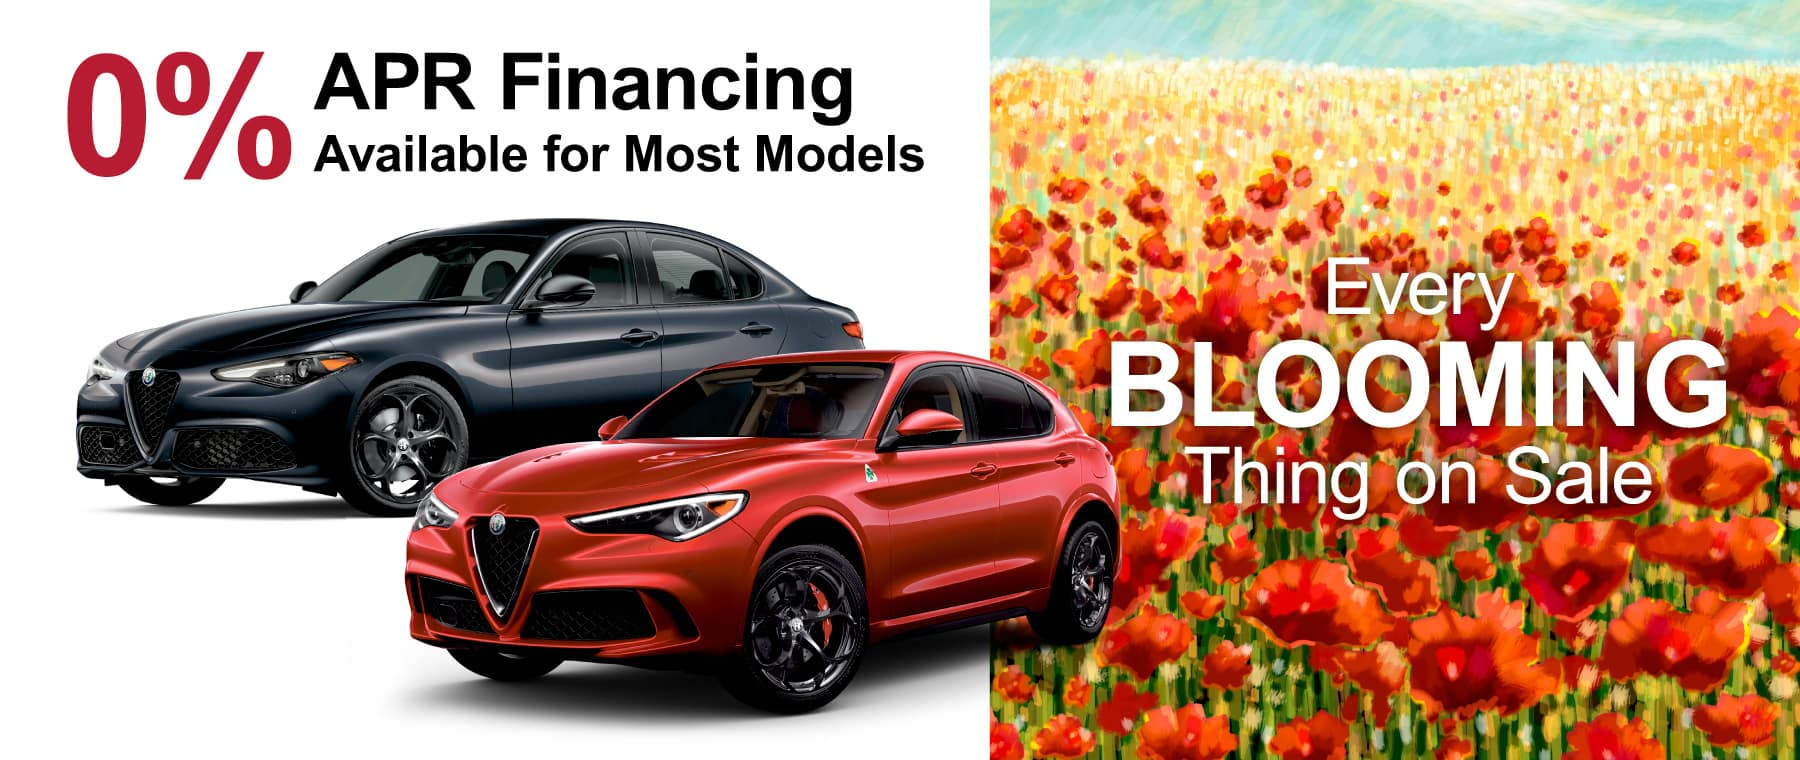 69048-ZARS_1800x760-Blooming_Alfa